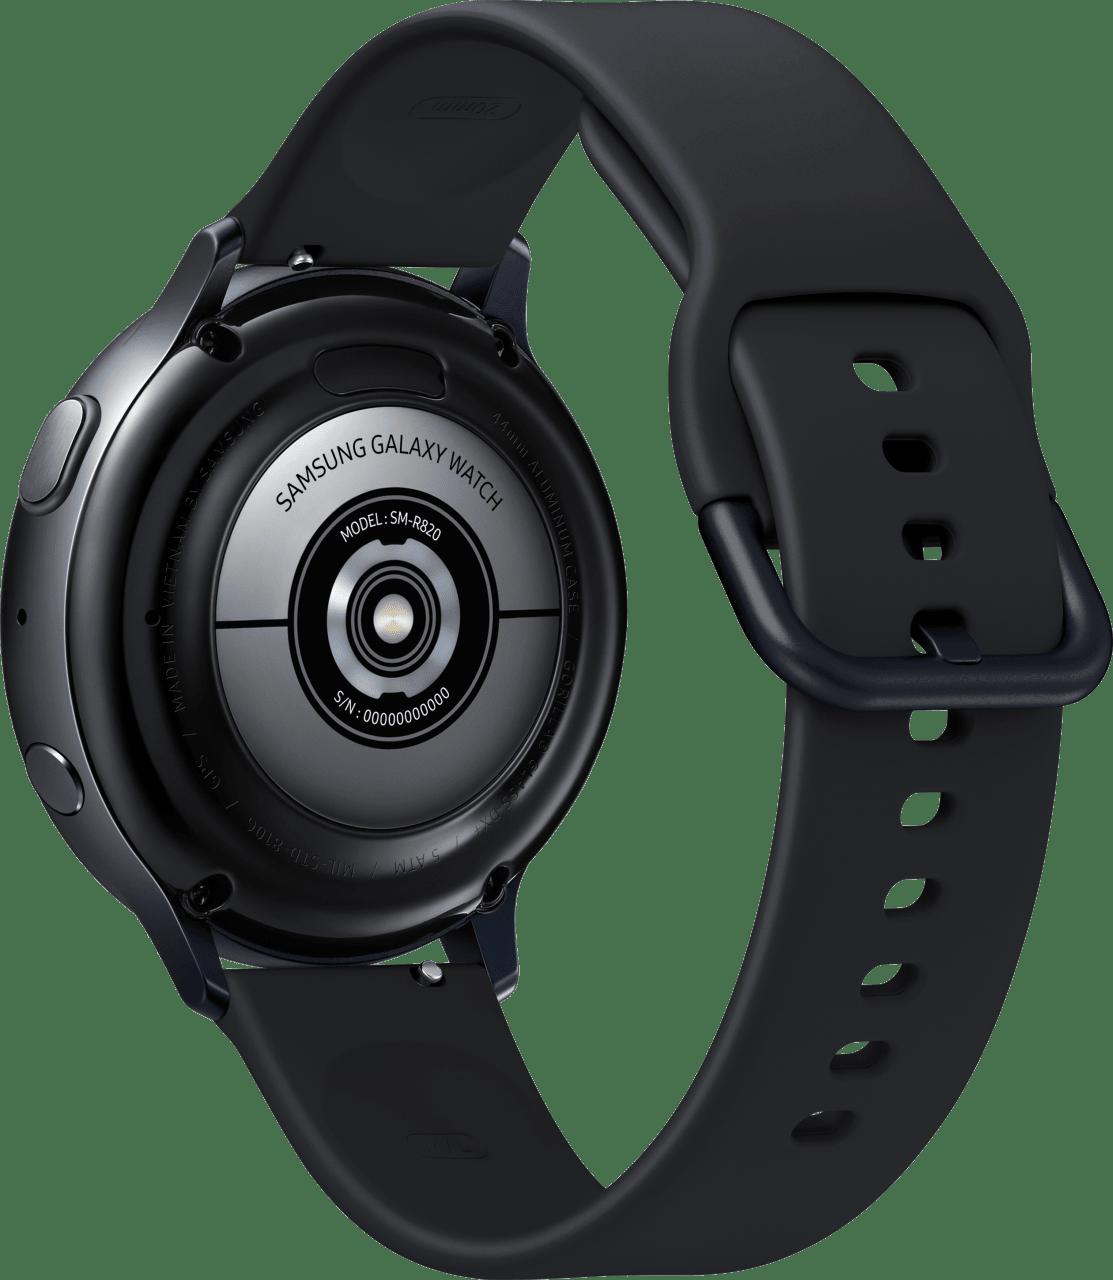 Aqua Black Samsung Galaxy Watch Active2, 44mm Aluminium case, Sport band.3